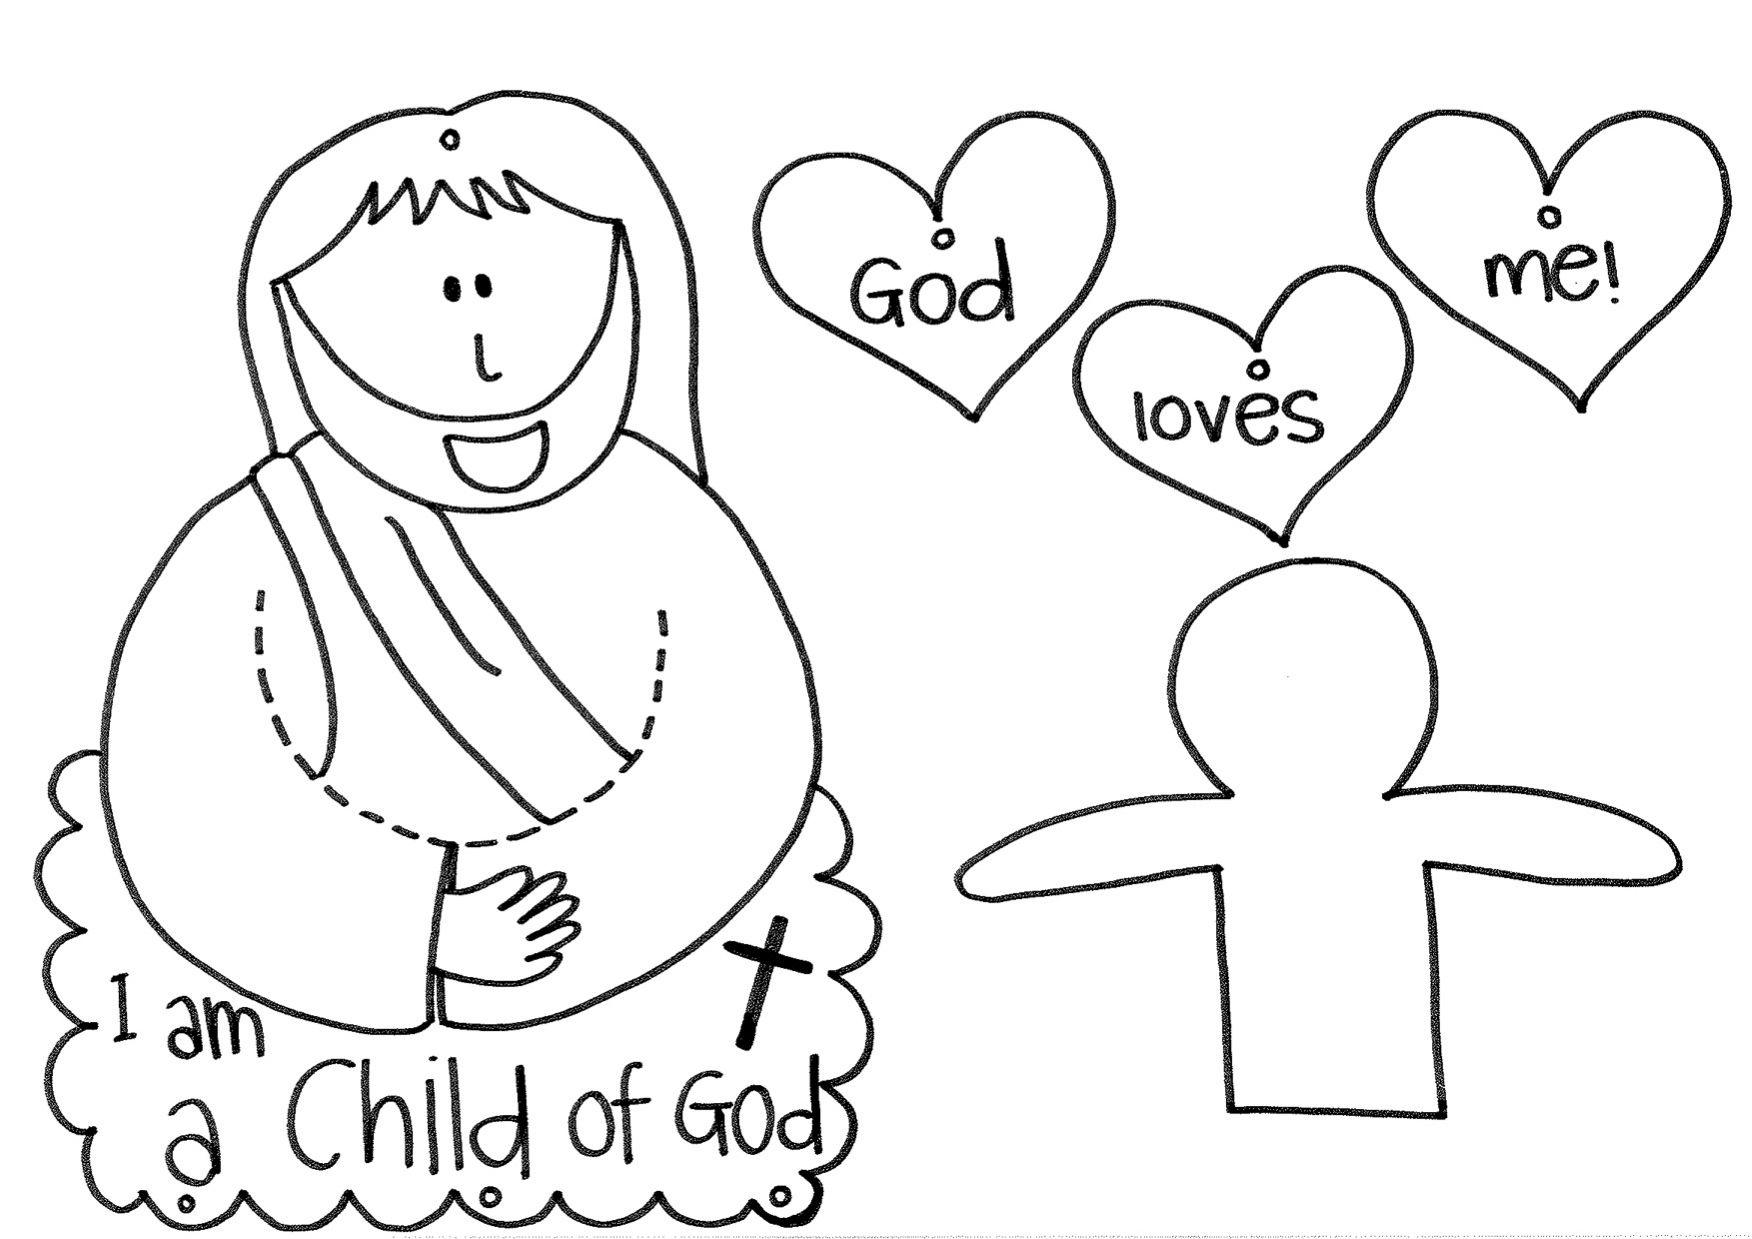 i am a child of God! | Sunday school crafts, School crafts ...